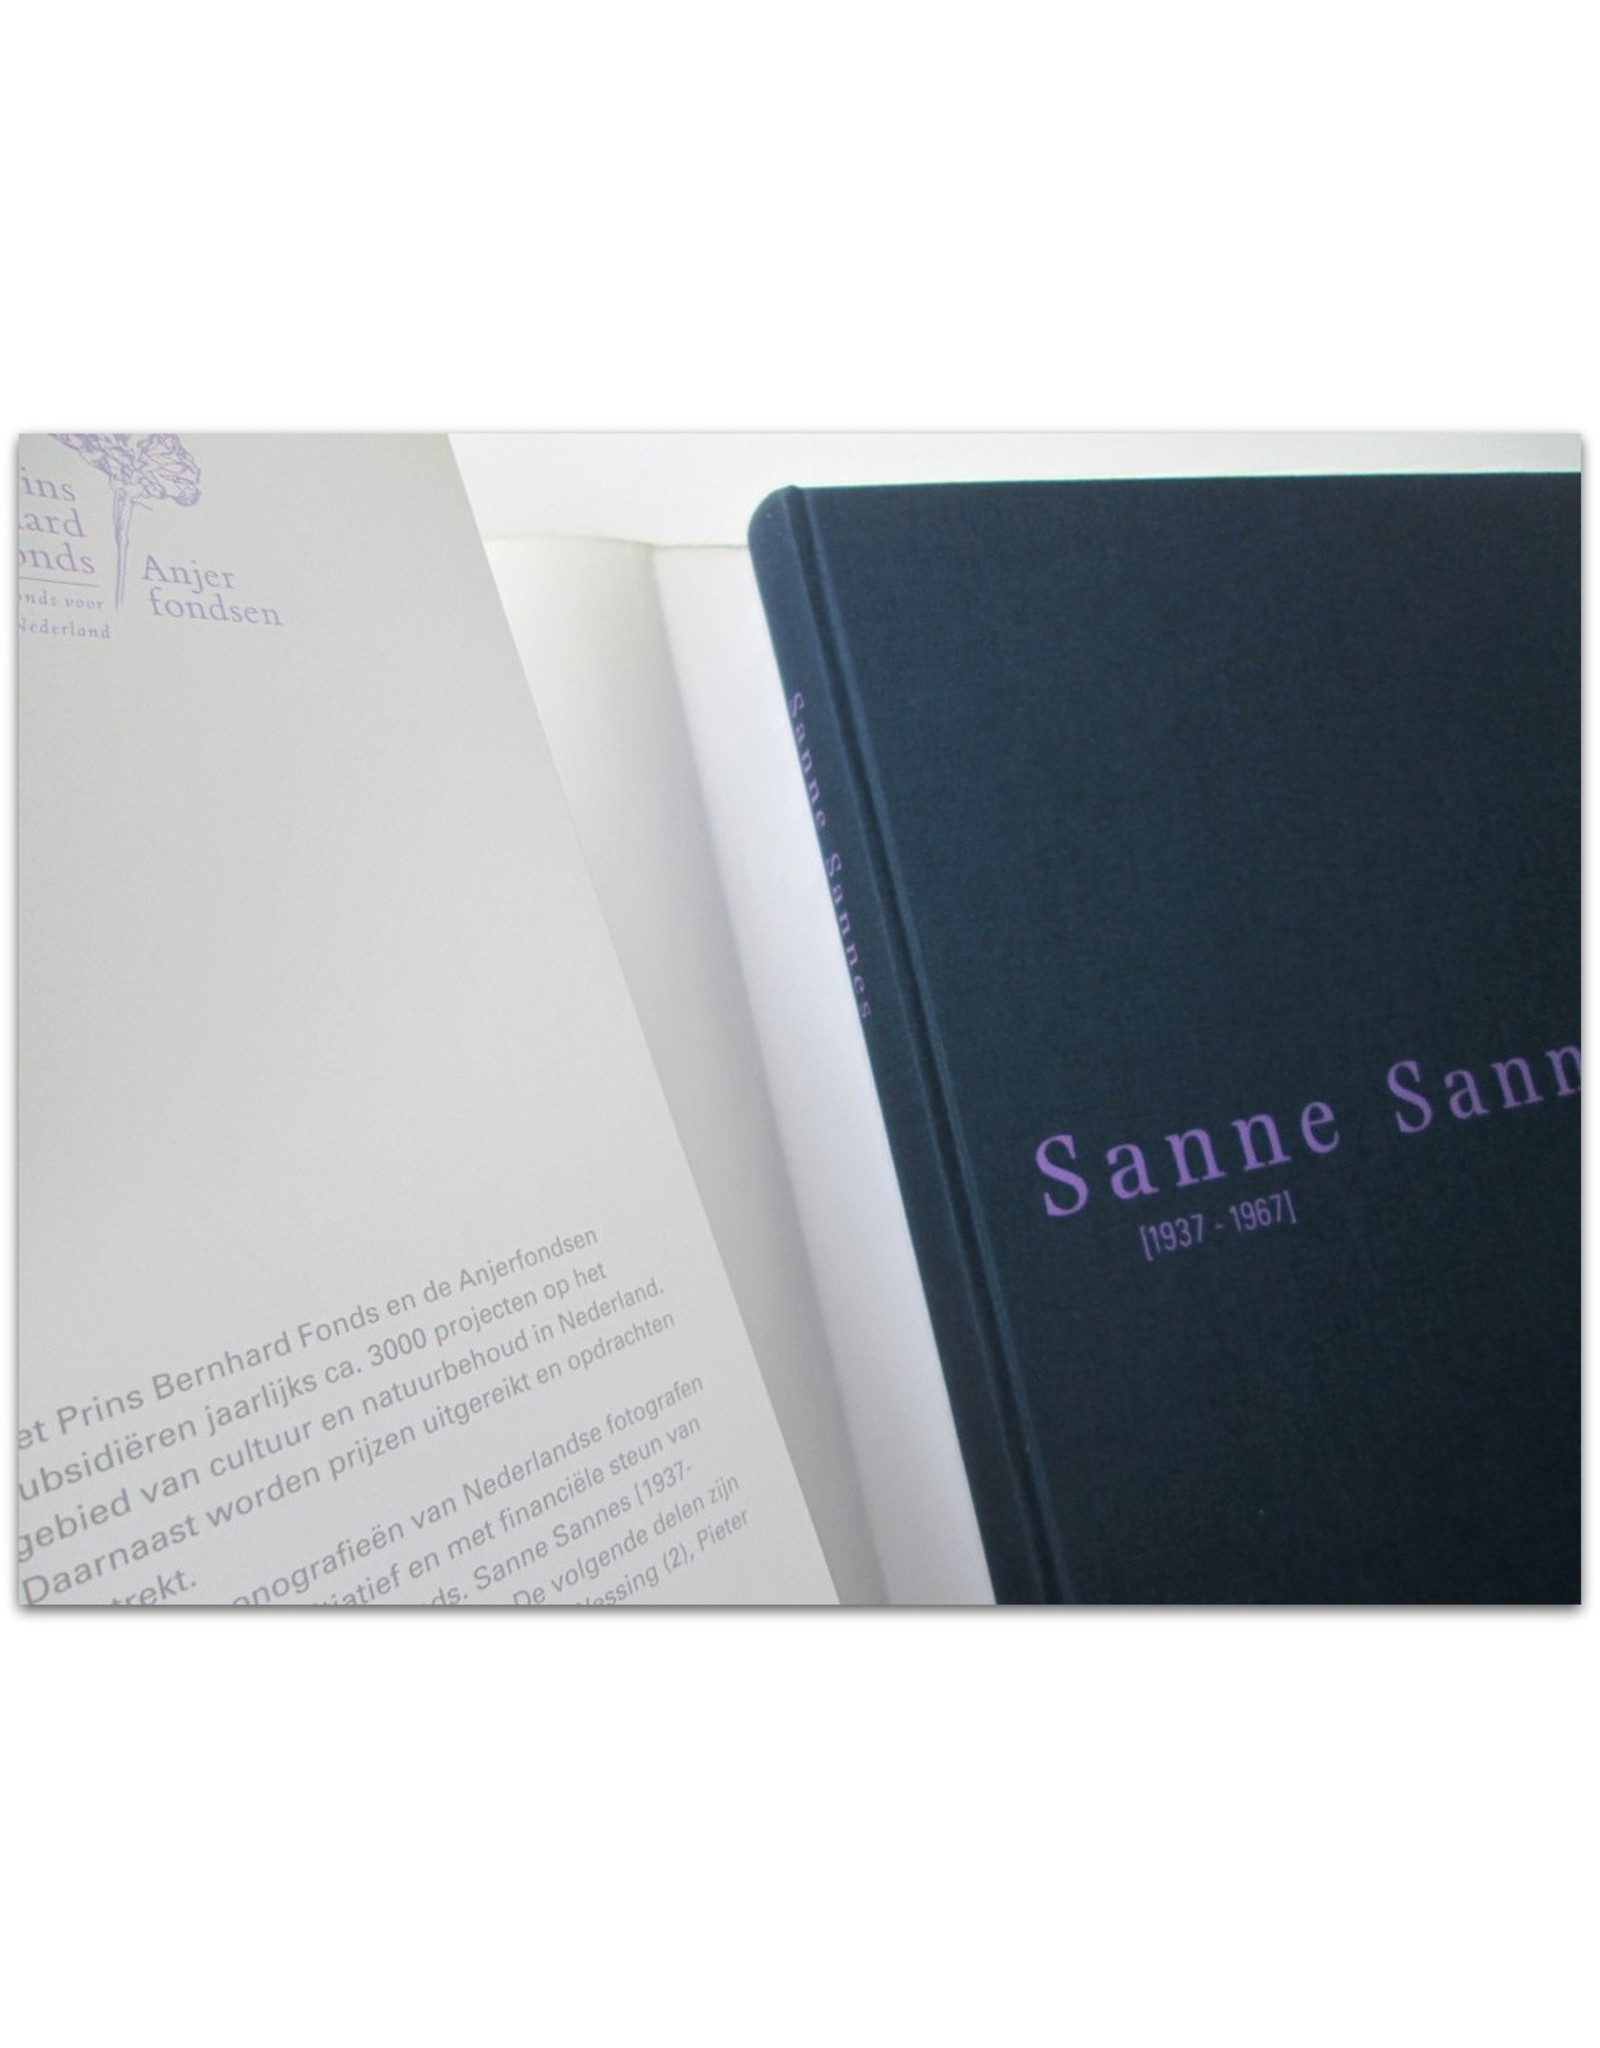 Cécile van der Harten & Gerard van Westerloo - Sanne Sannes [1937-1967]